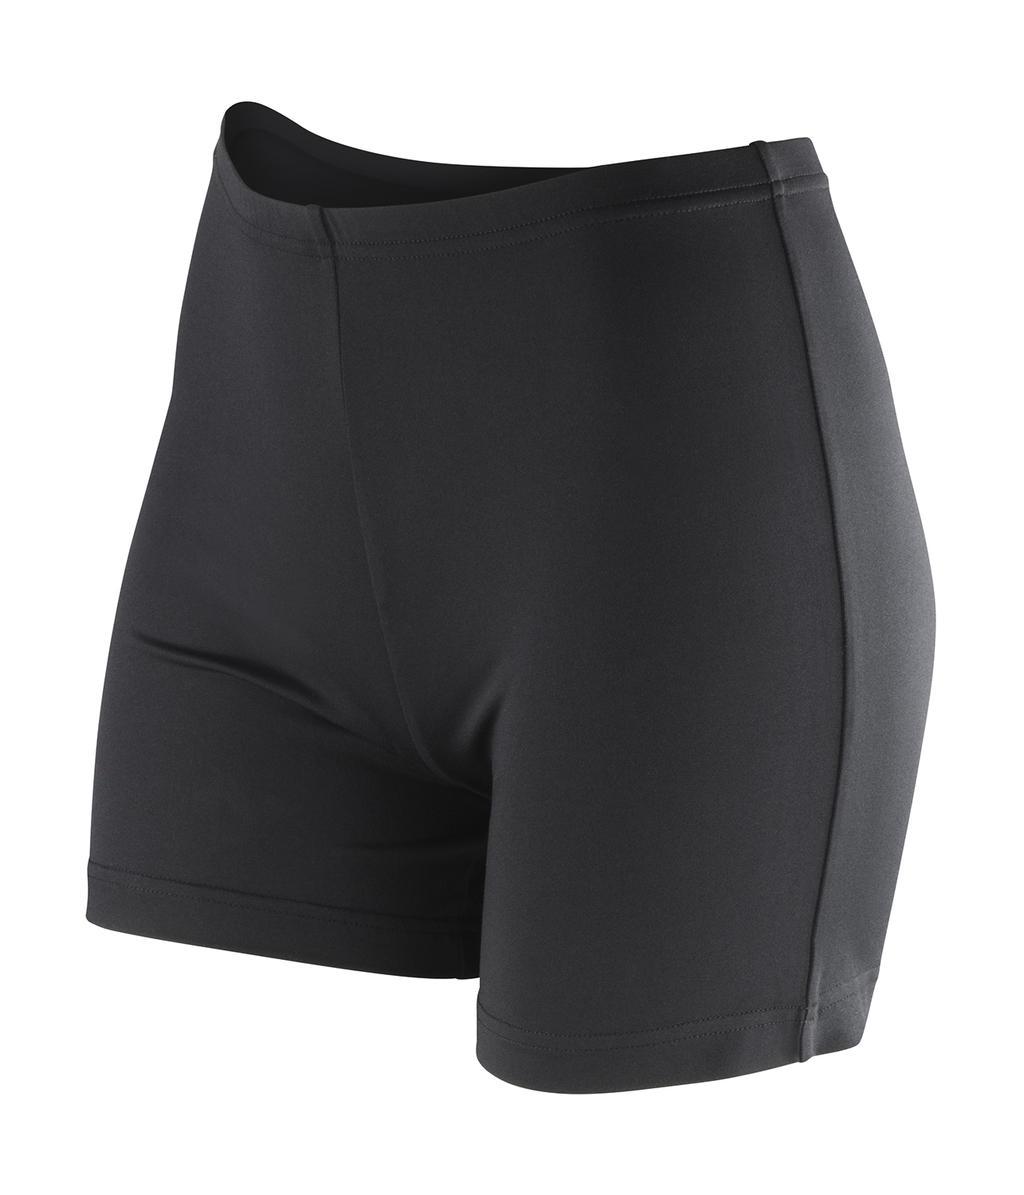 Dámske šortky Impact Softex® - zvìtšit obrázek